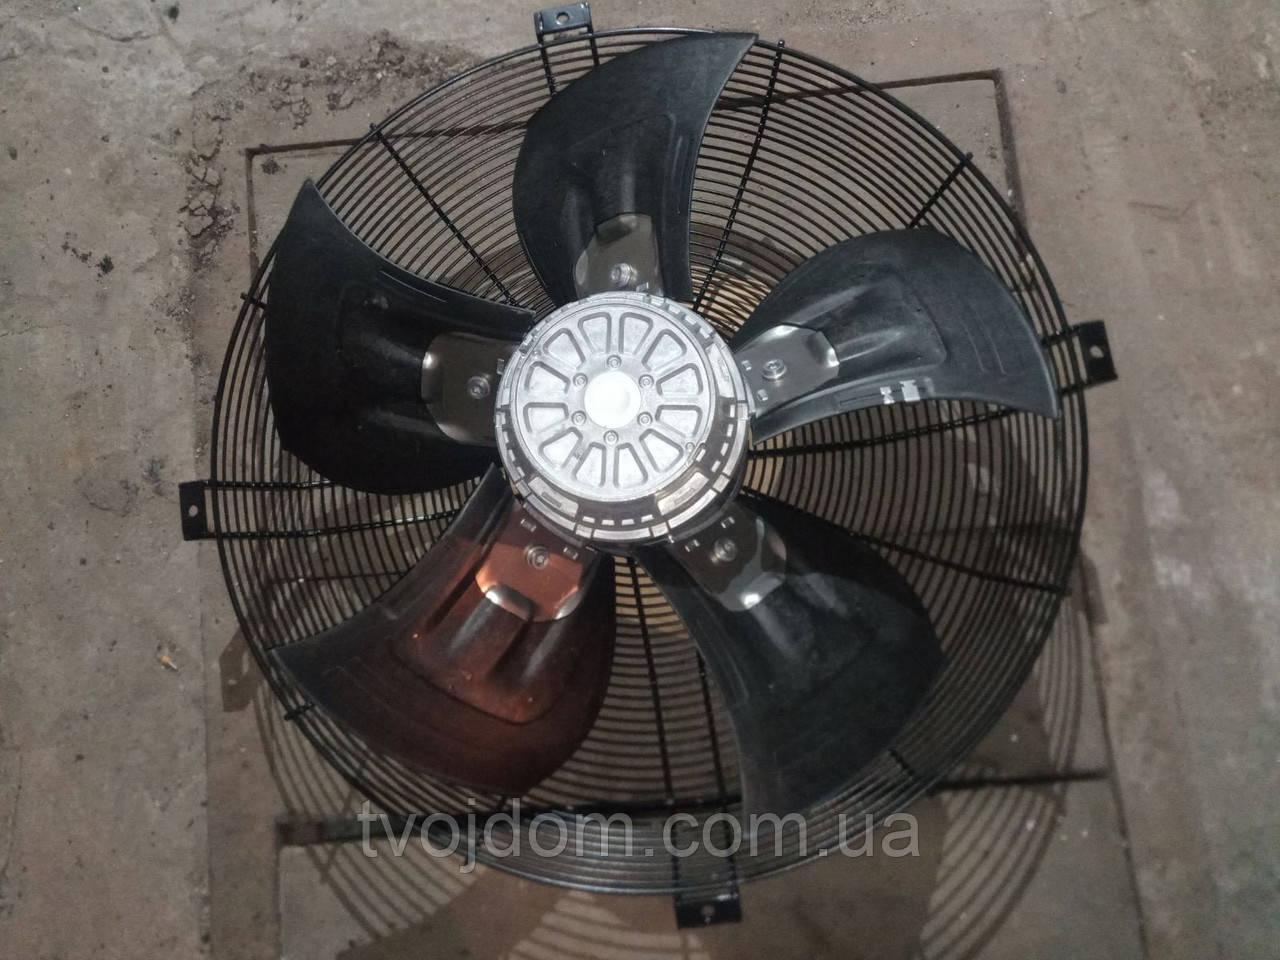 Осевой вентилятор EBM-Papst S4D630-AD01-01